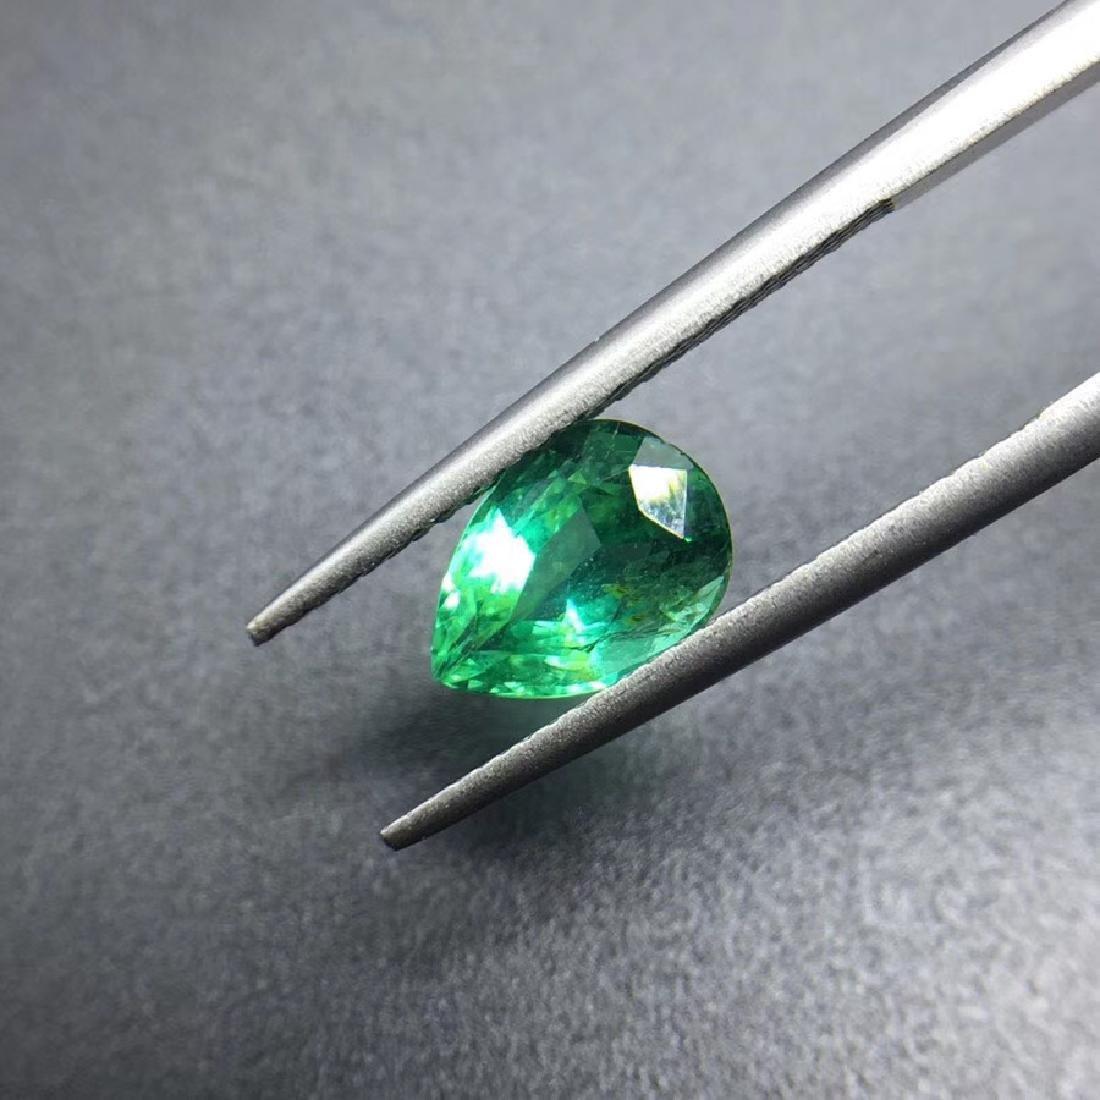 1.43 ct Emerald 6.2*8.9*4.7 mm Pear Cut - 3